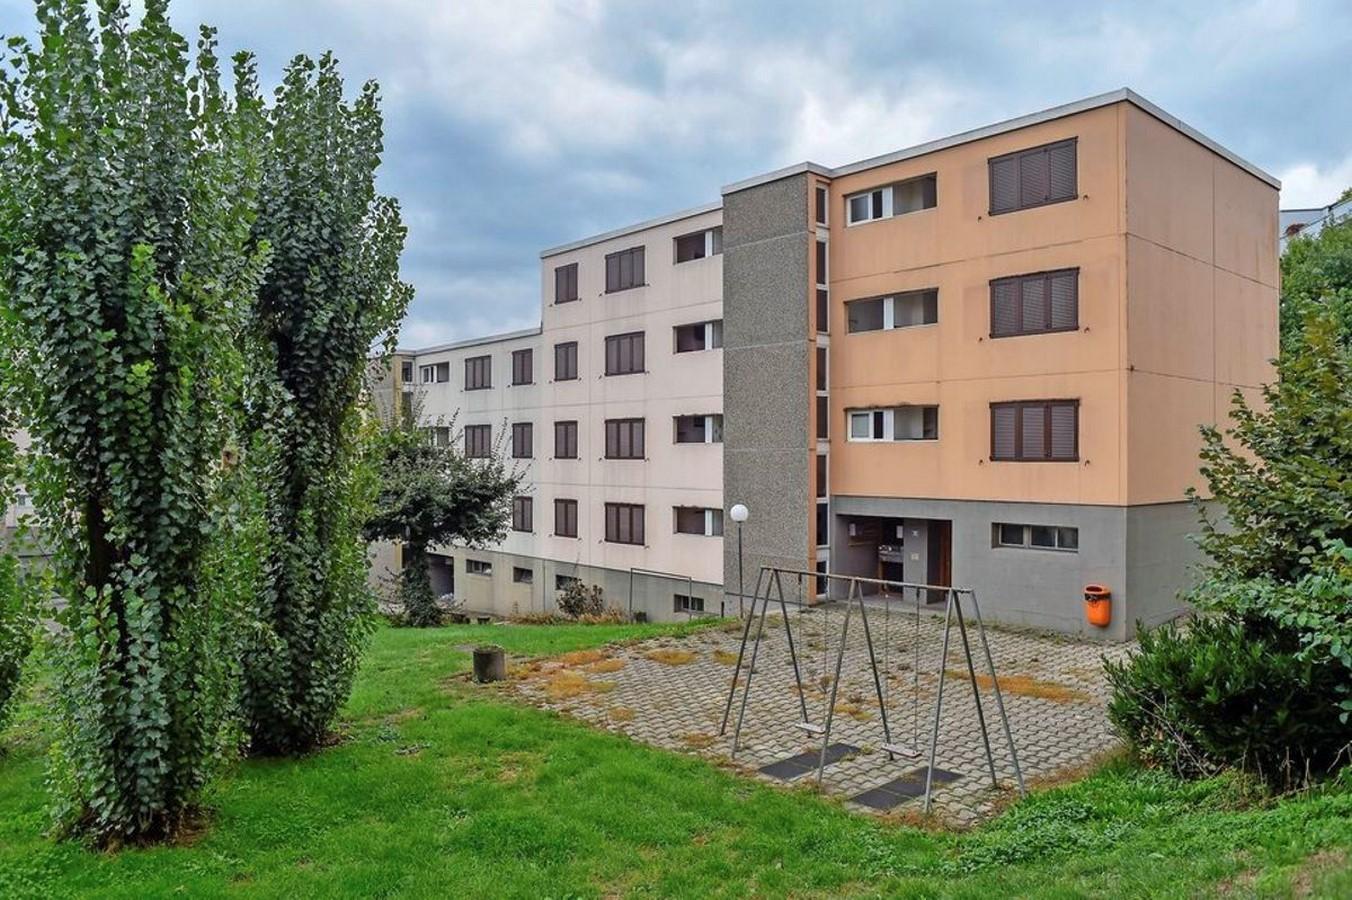 Hangenmoos settlement, Wädenswil - Sheet2